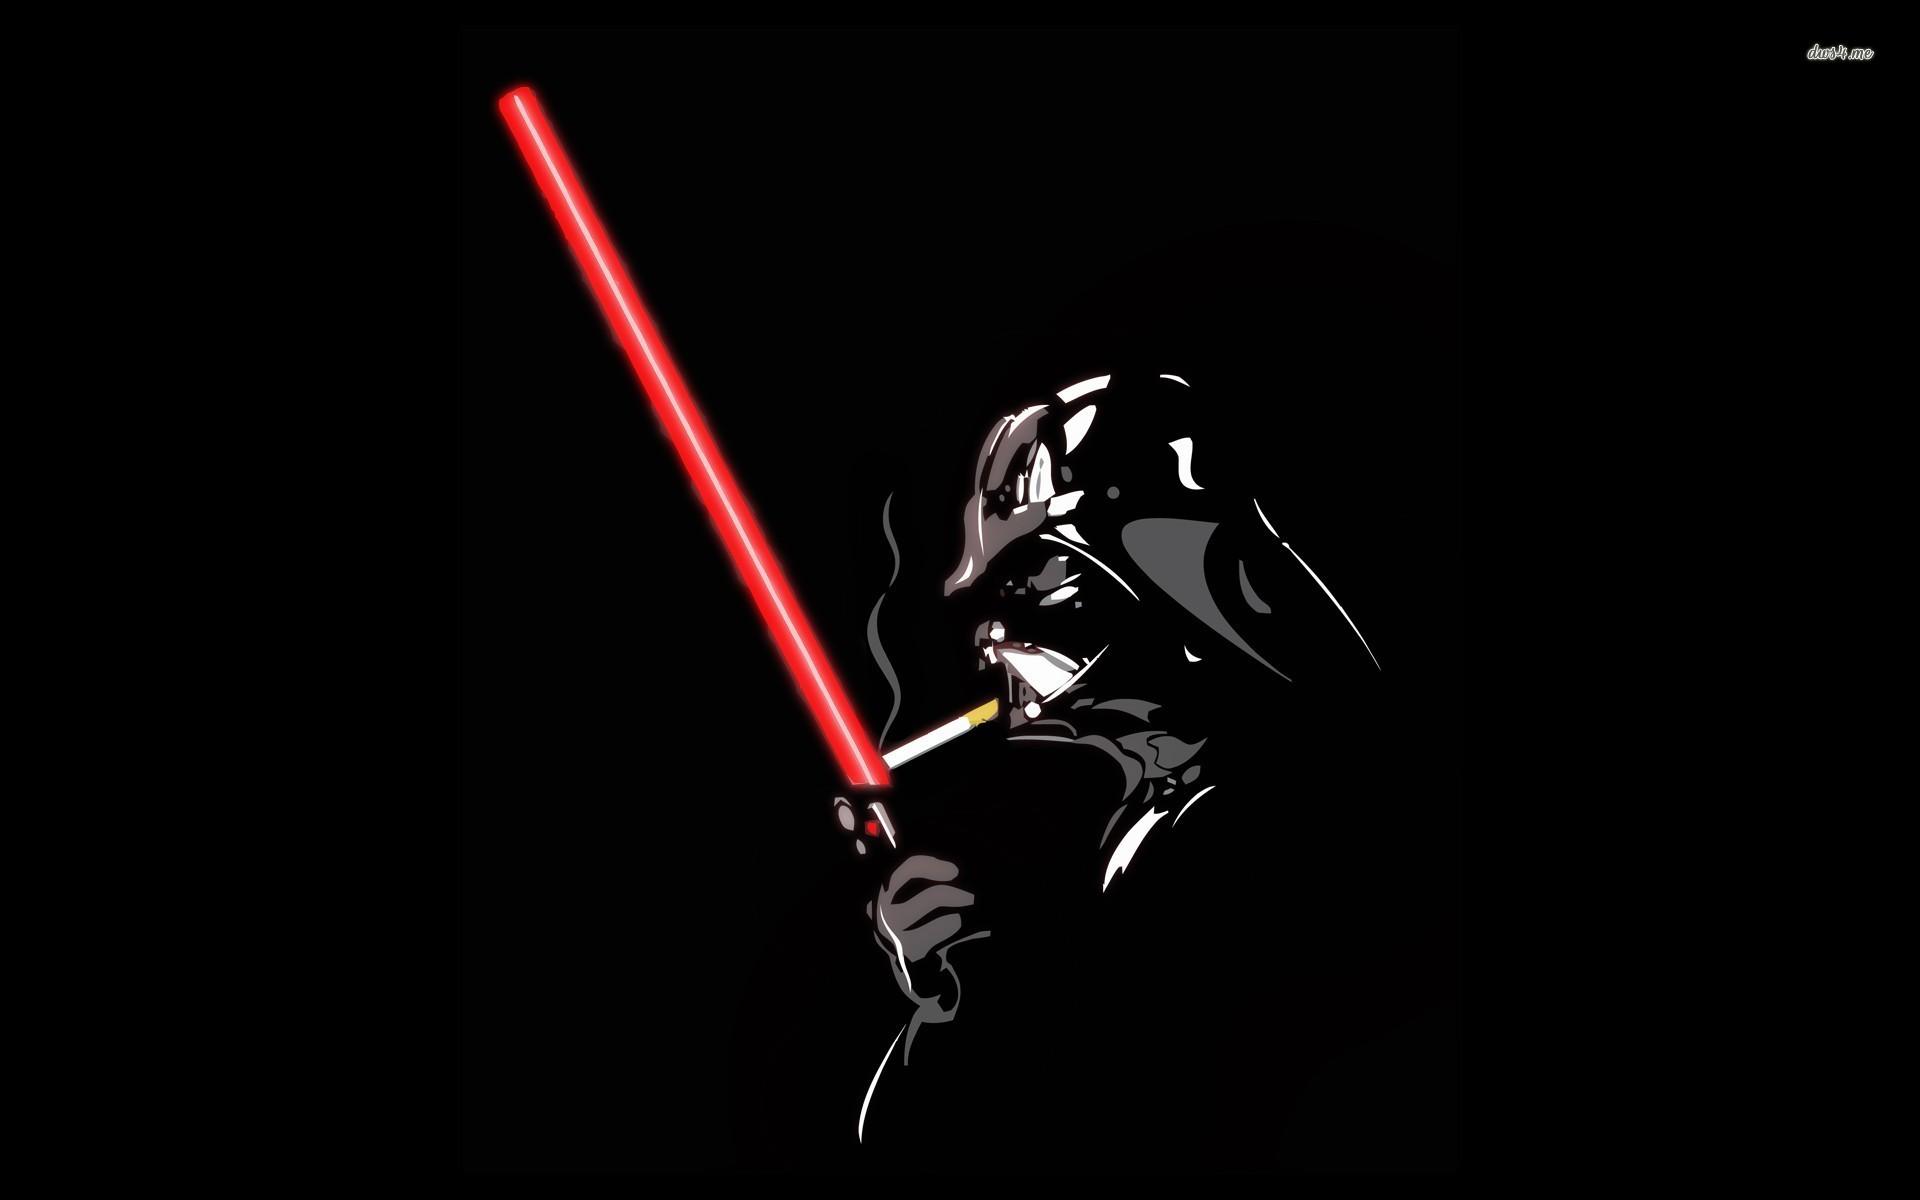 Darth Vader Wallpapers Full HD wallpaper search